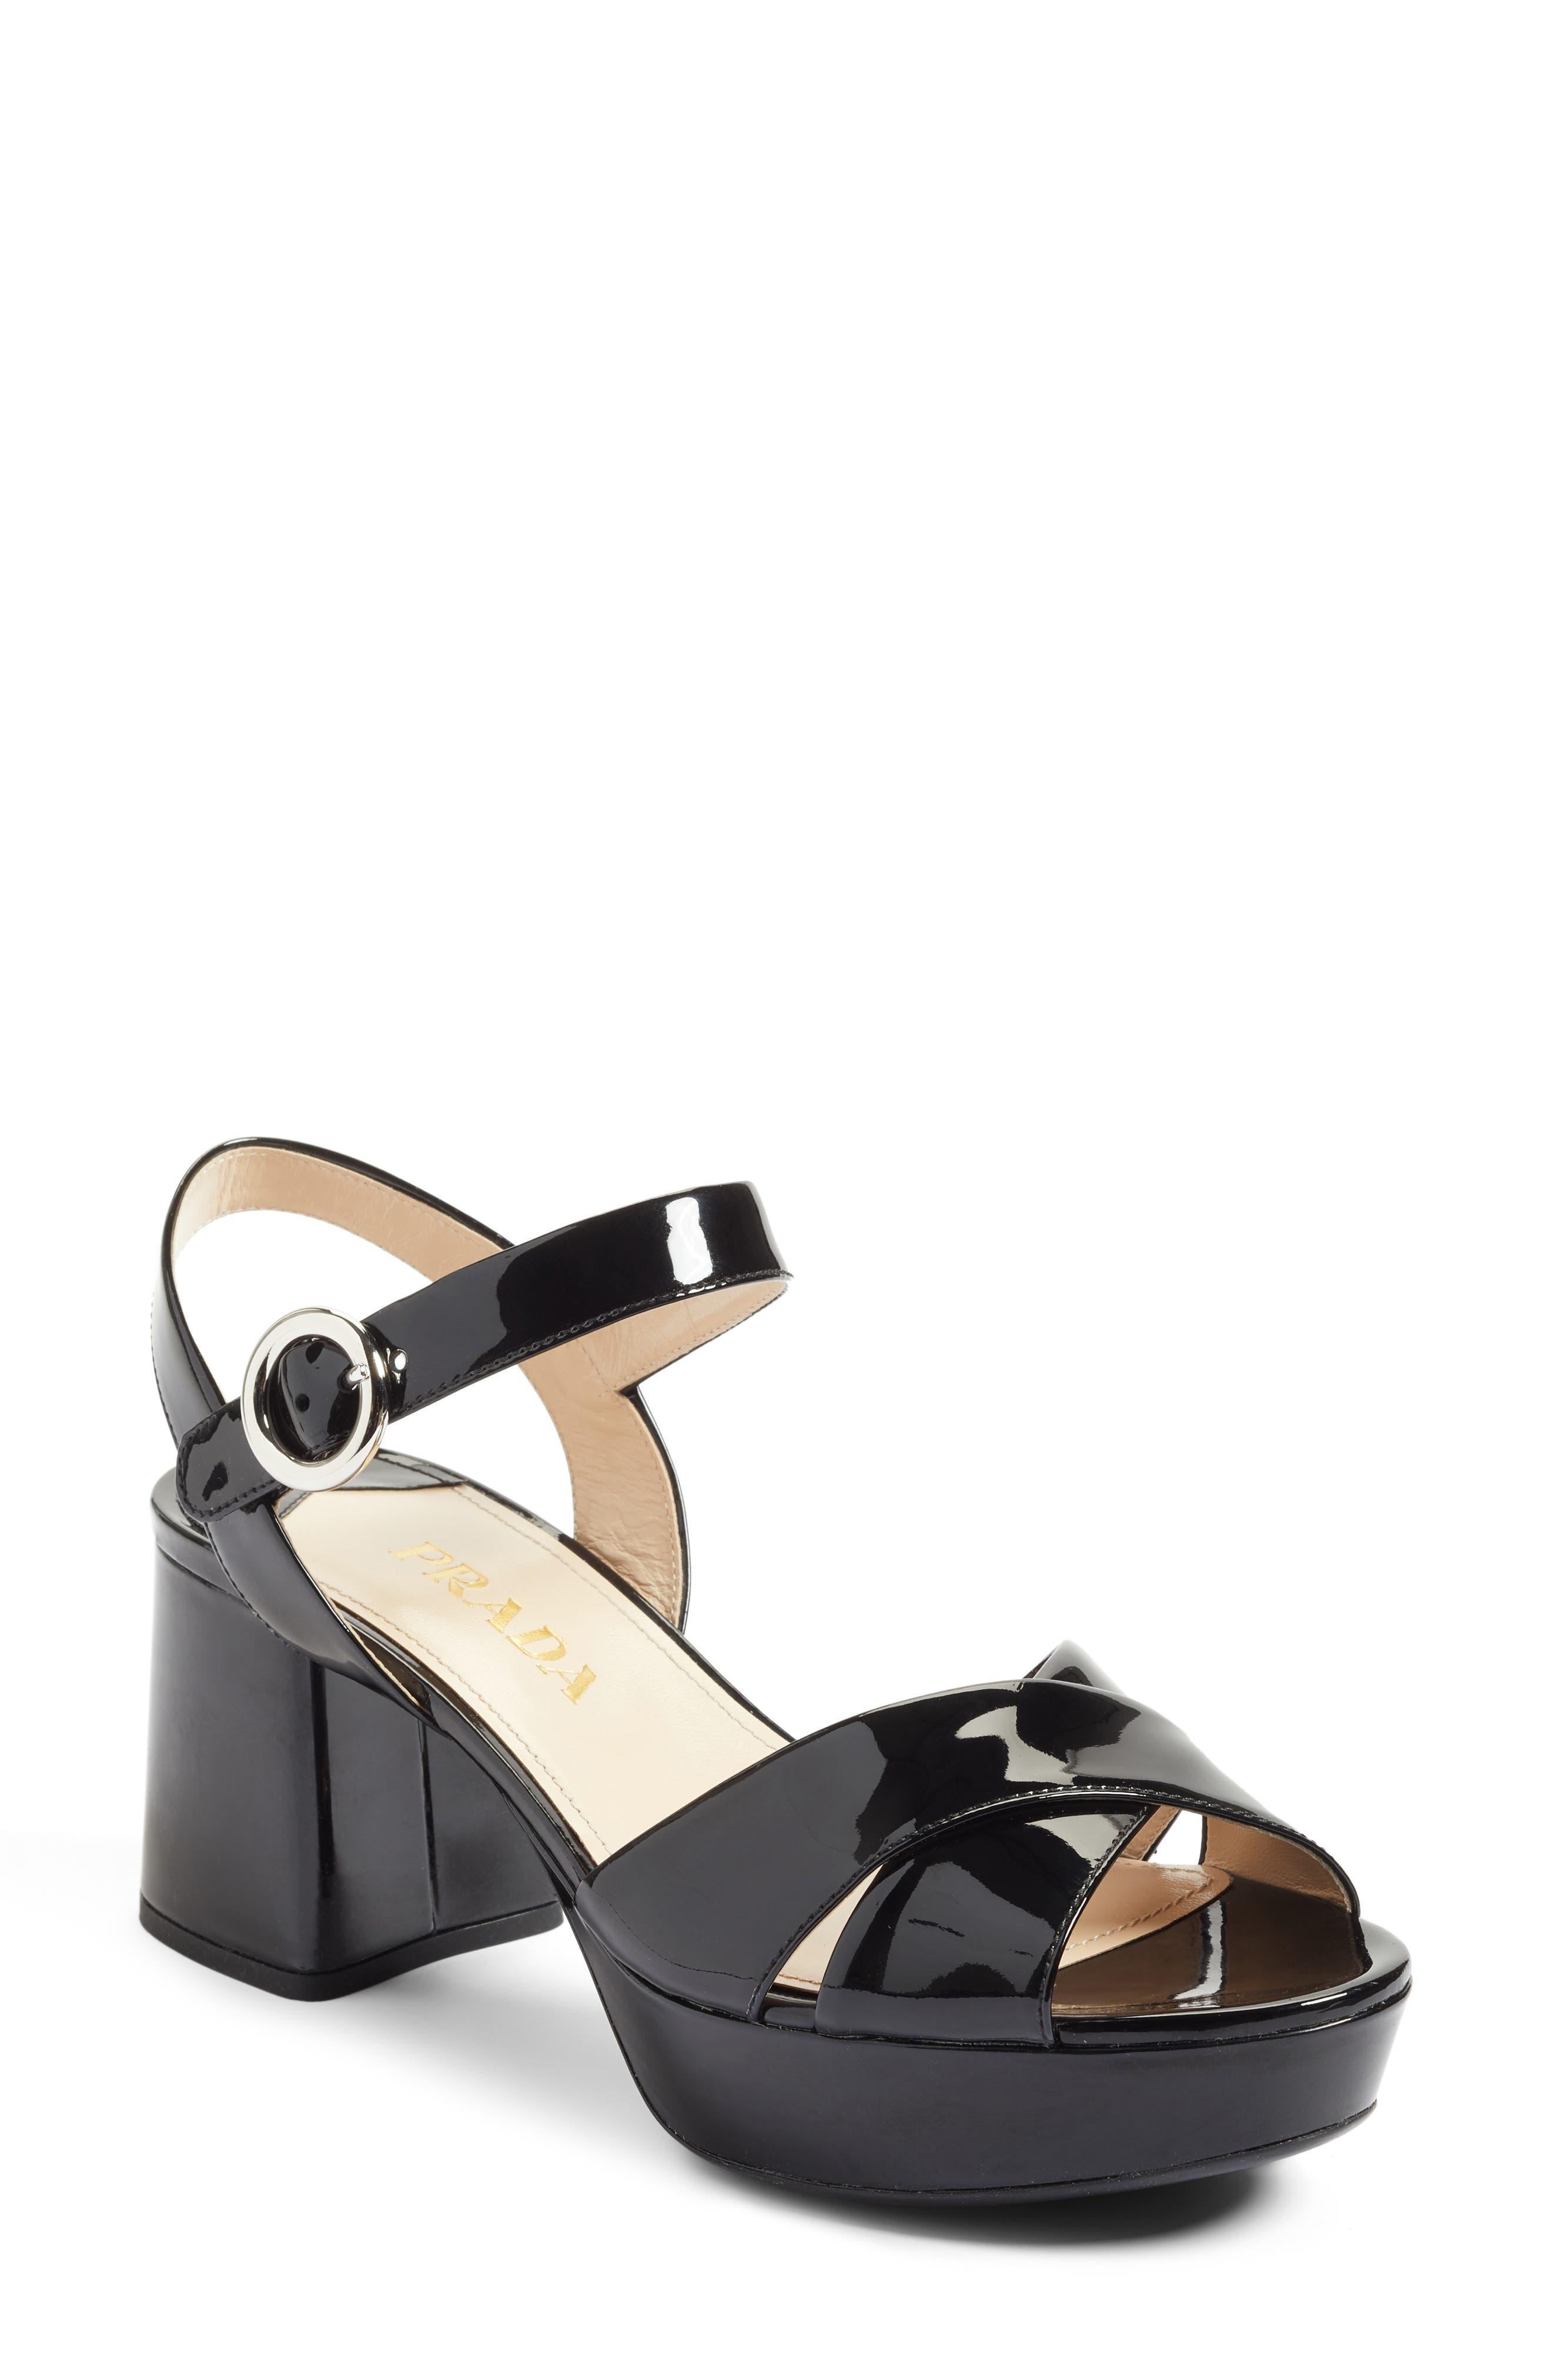 Strappy Platform Sandal,                         Main,                         color, Black Patent